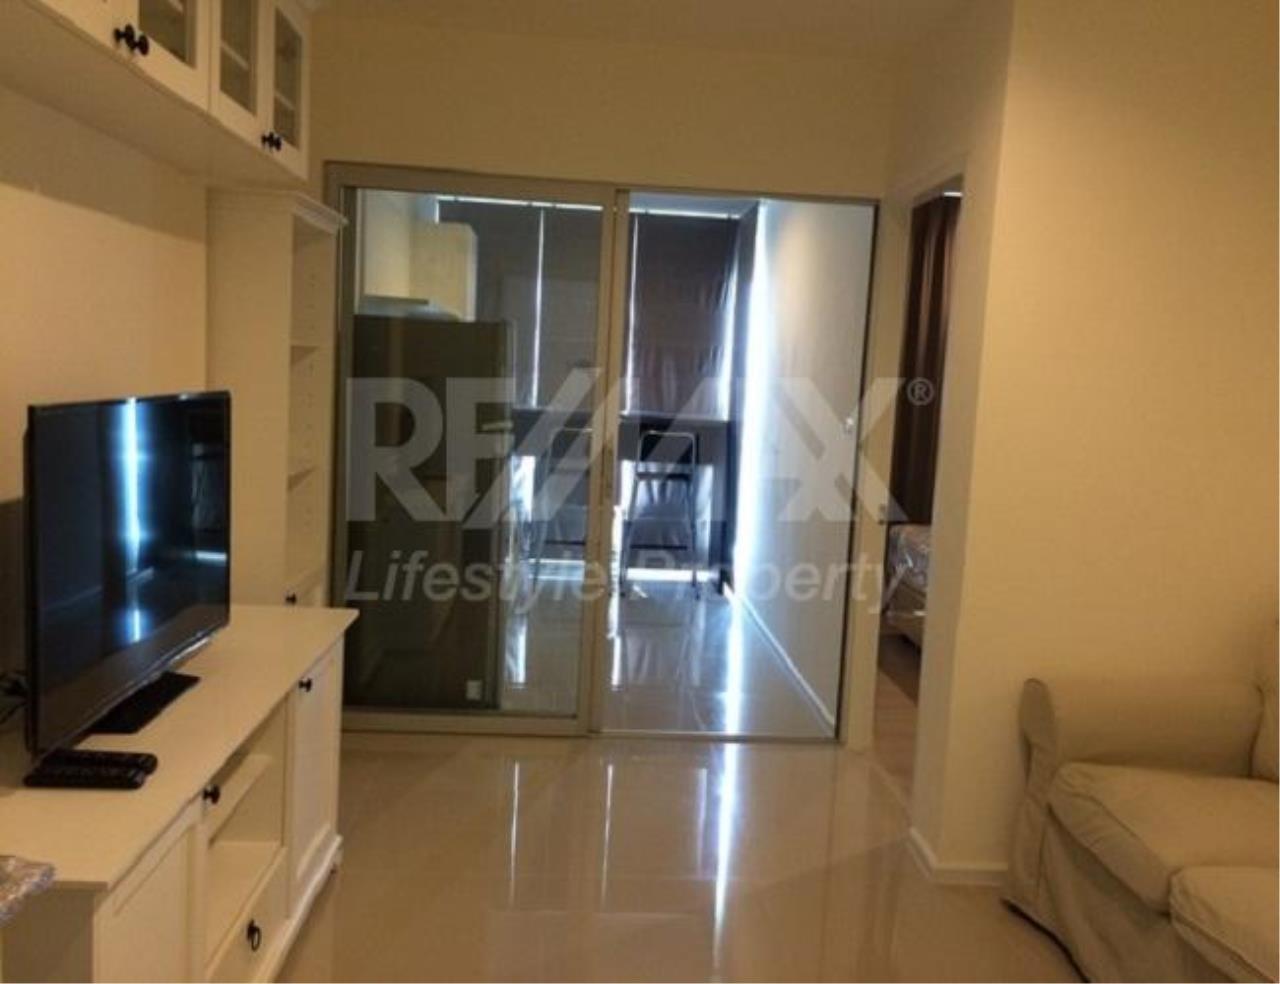 RE/MAX LifeStyle Property Agency's Aspire Sukhumvit 48 9